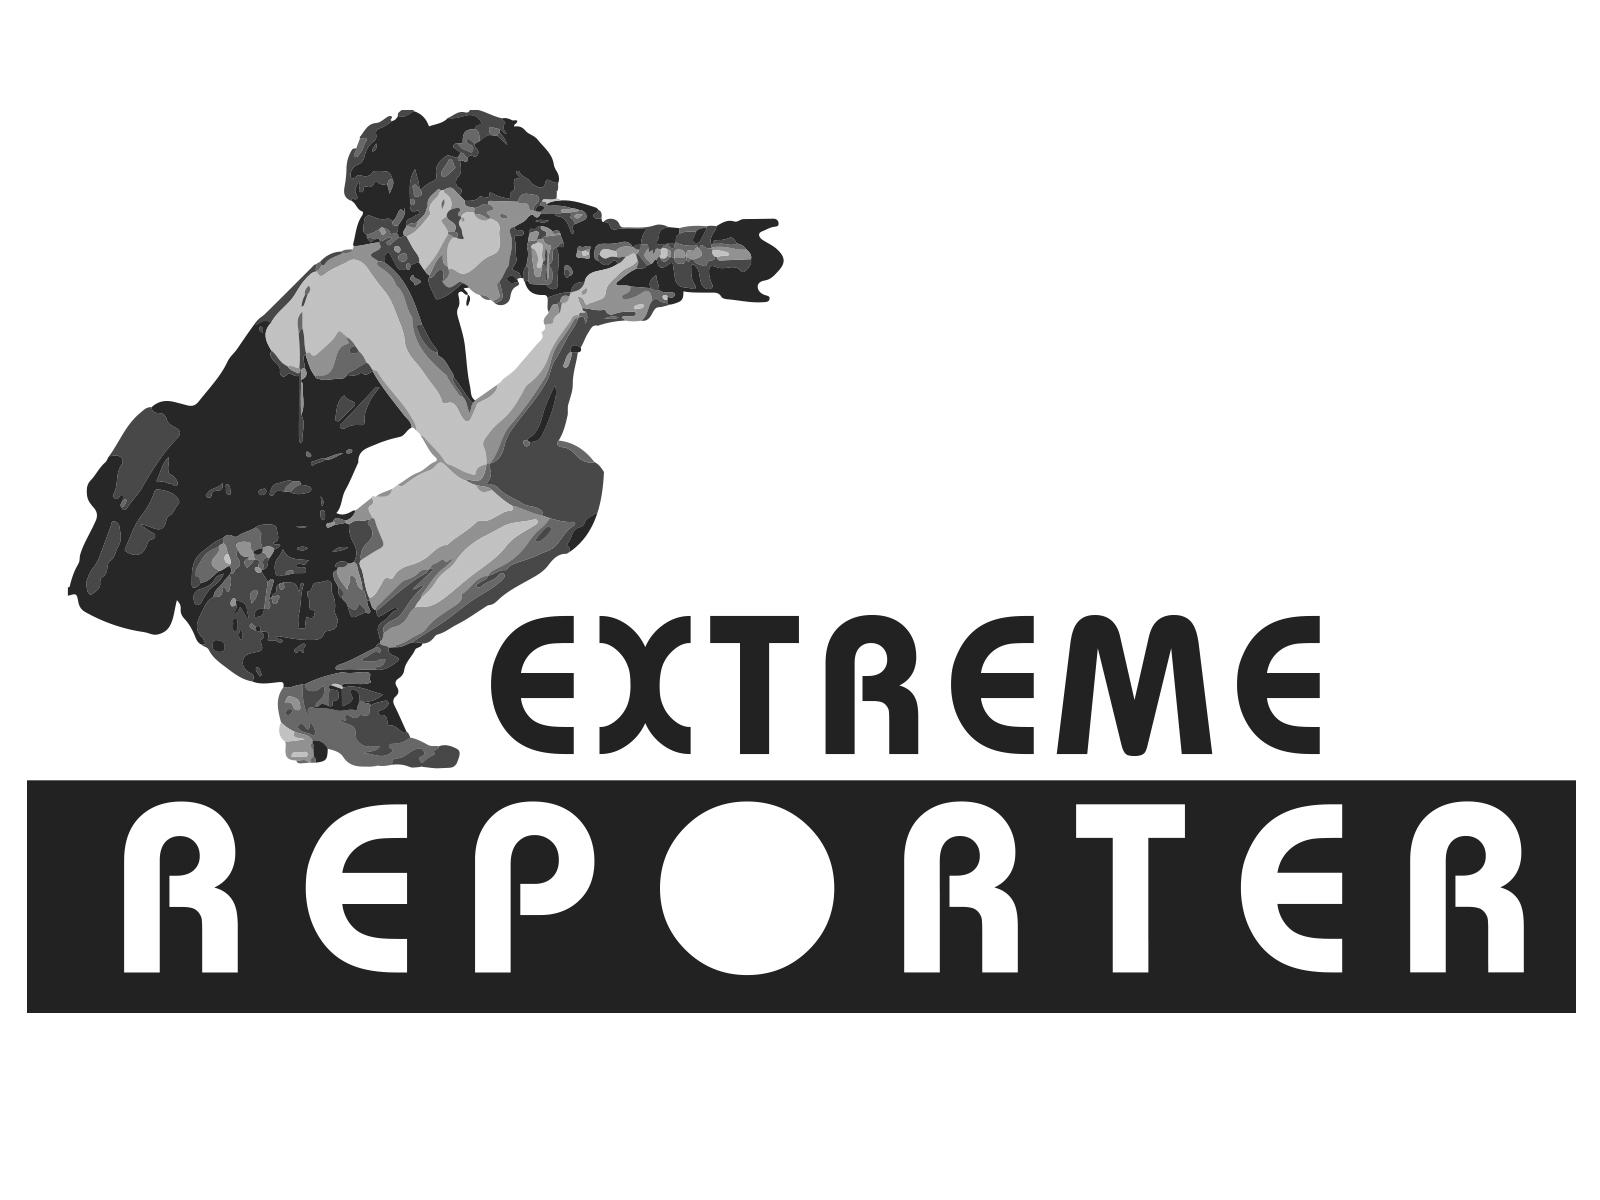 Логотип для экстрим фотографа.  фото f_7735a53f04026e4e.jpg